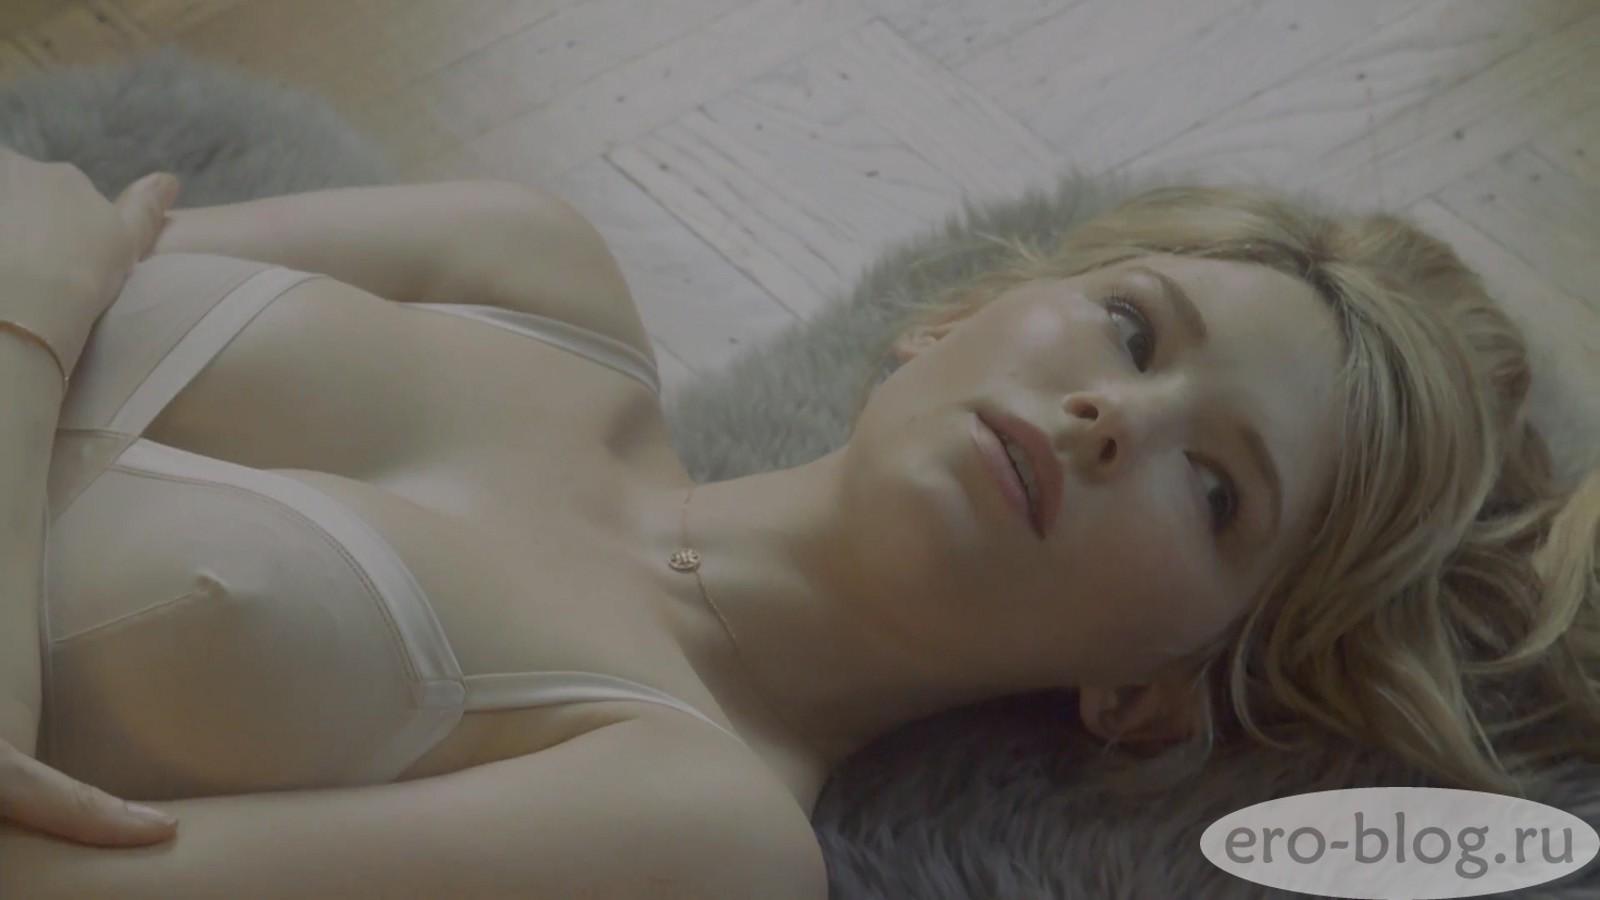 Голая обнаженная Haley Bennett | Хейли Беннетт интимные фото звезды